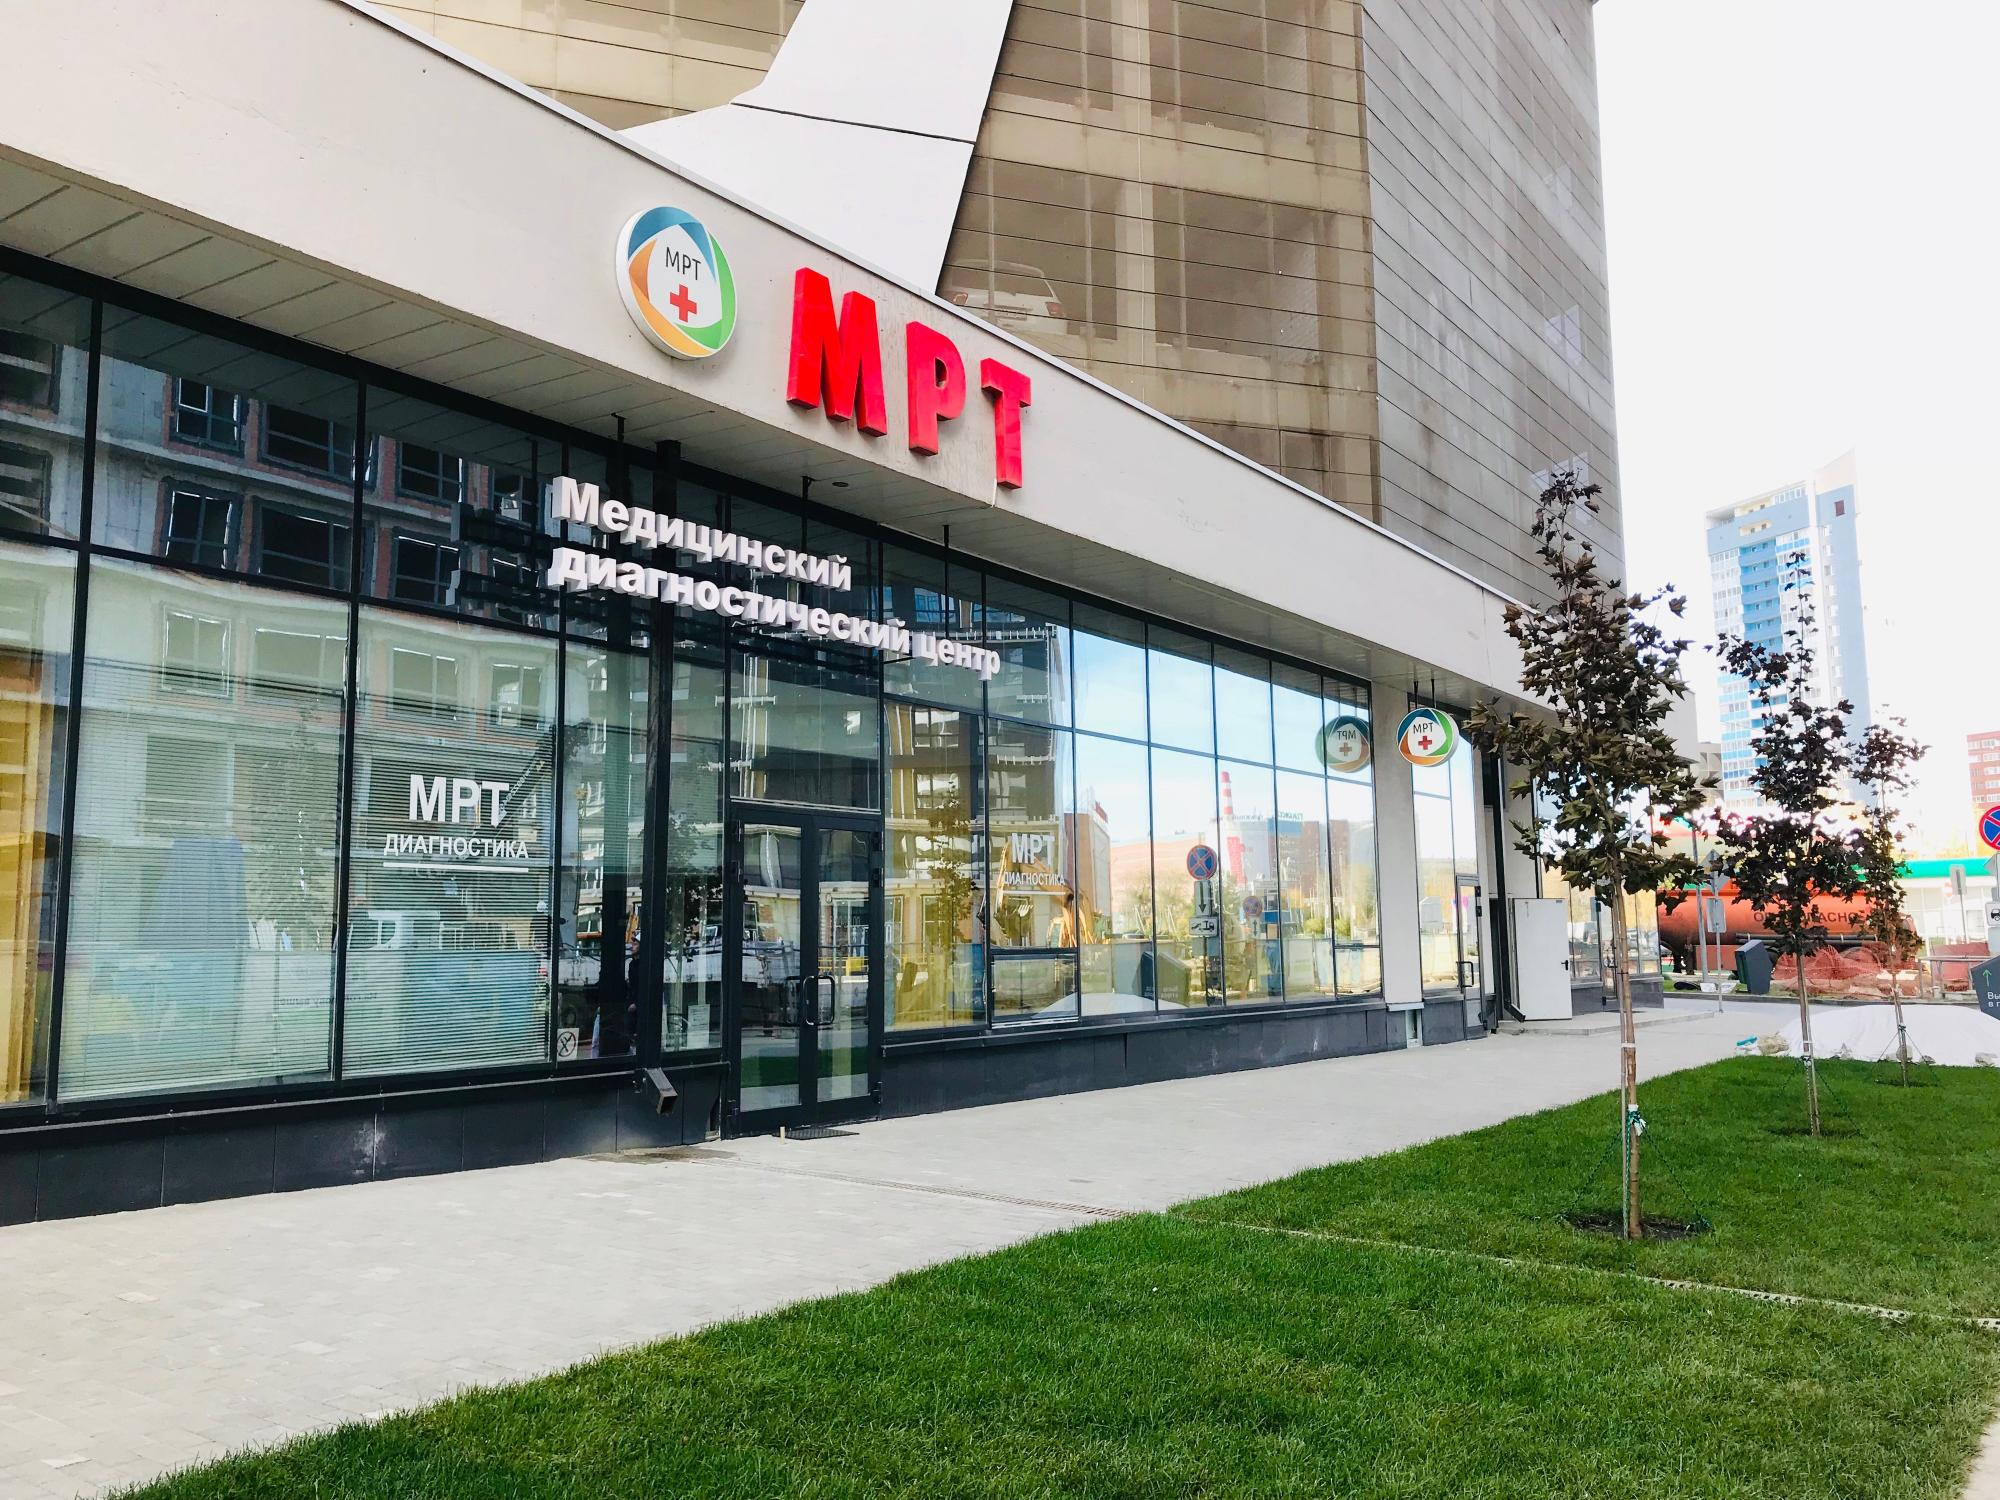 фотография Центра МРТ на улице Ткачей, 21